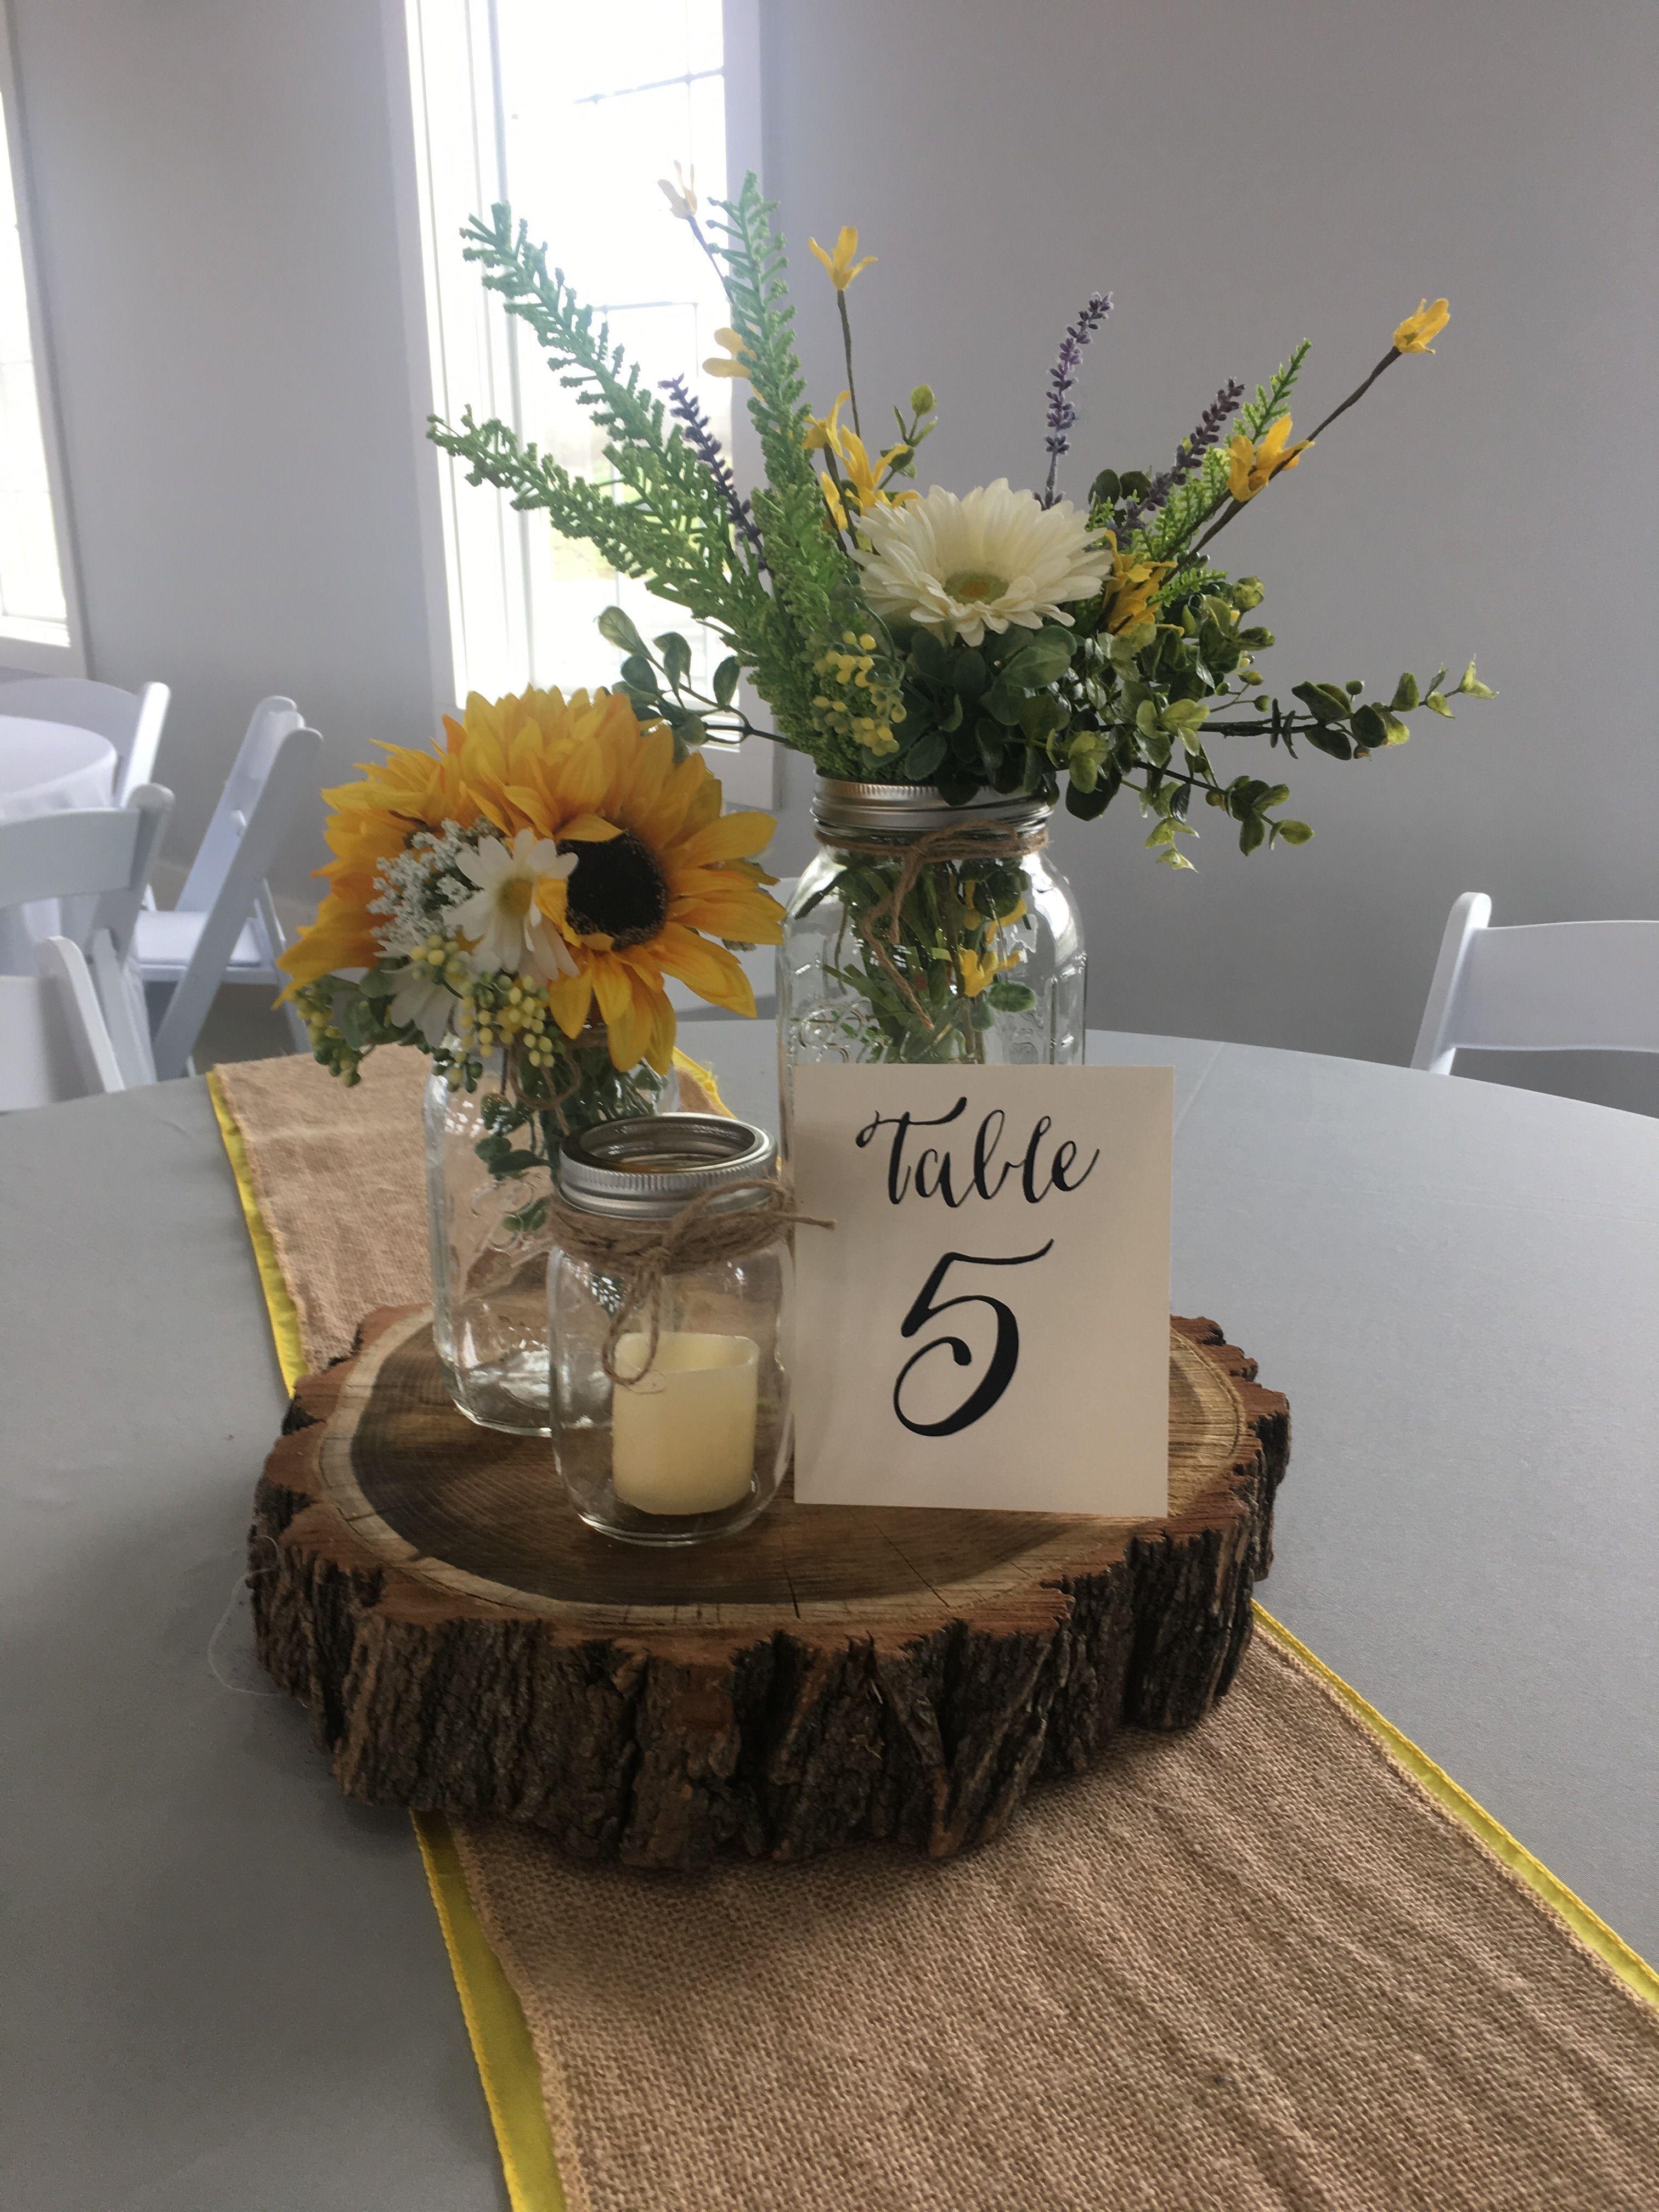 Rustic Centerpiece Using Mason Jars Sunflowers Greenery W Wedding Centerpieces Mason Jars Sunflower Wedding Centerpieces Sunflower Wedding Decorations